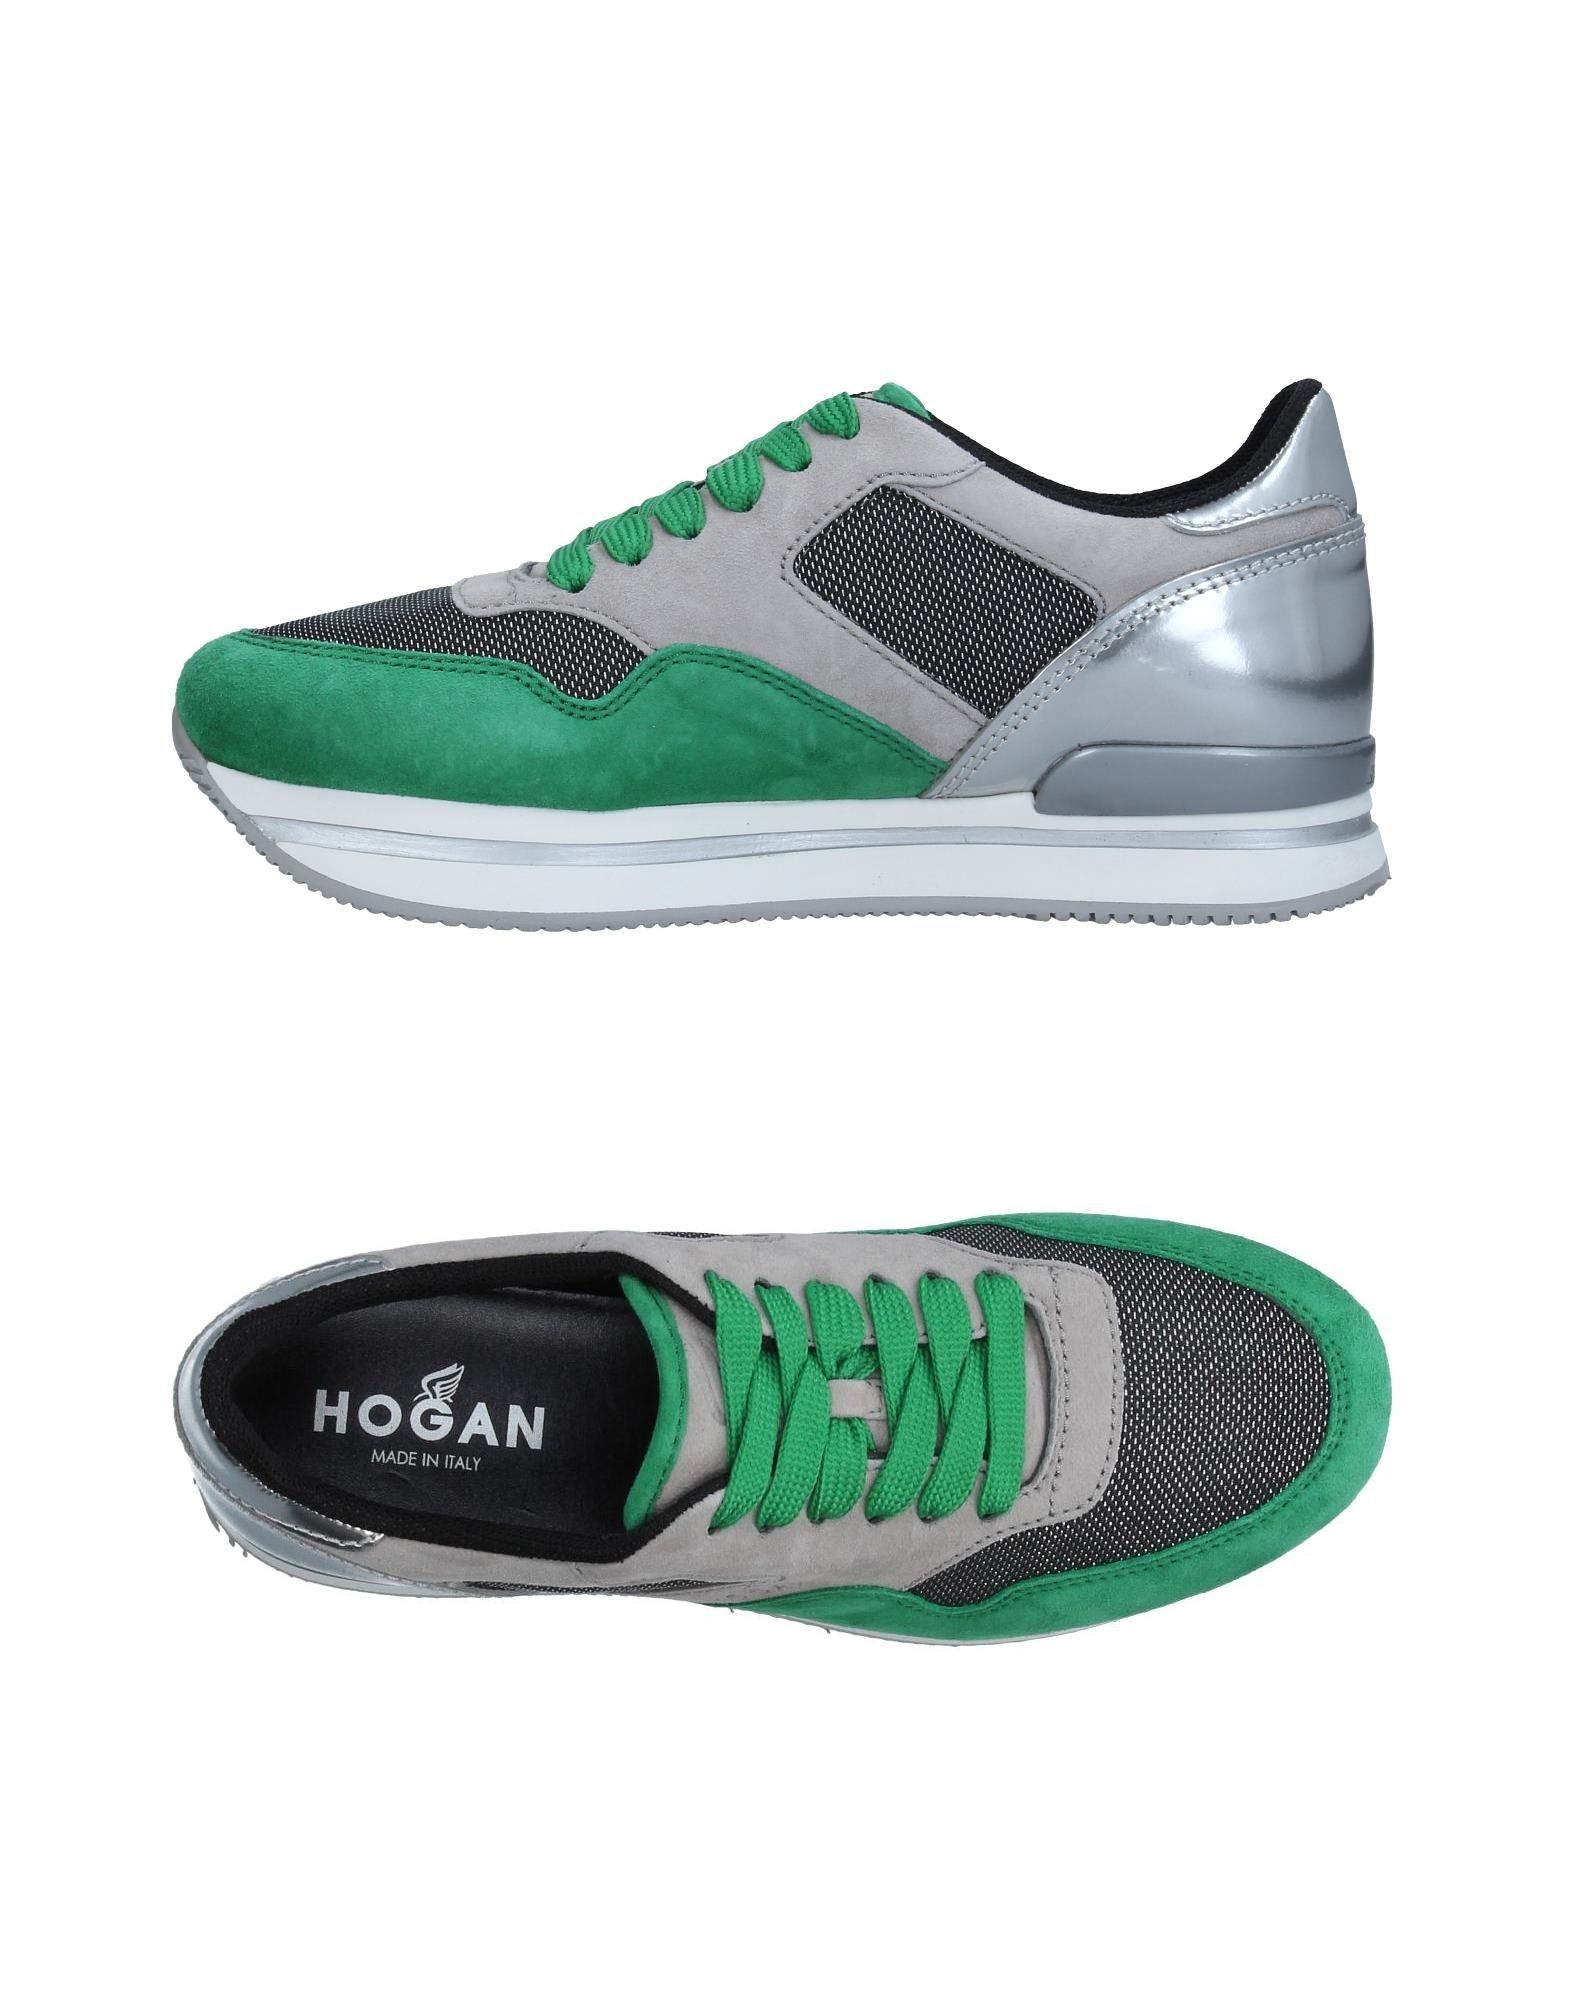 Baskets Hogan Femme - Baskets Hogan Gris Chaussures femme pas cher homme et femme